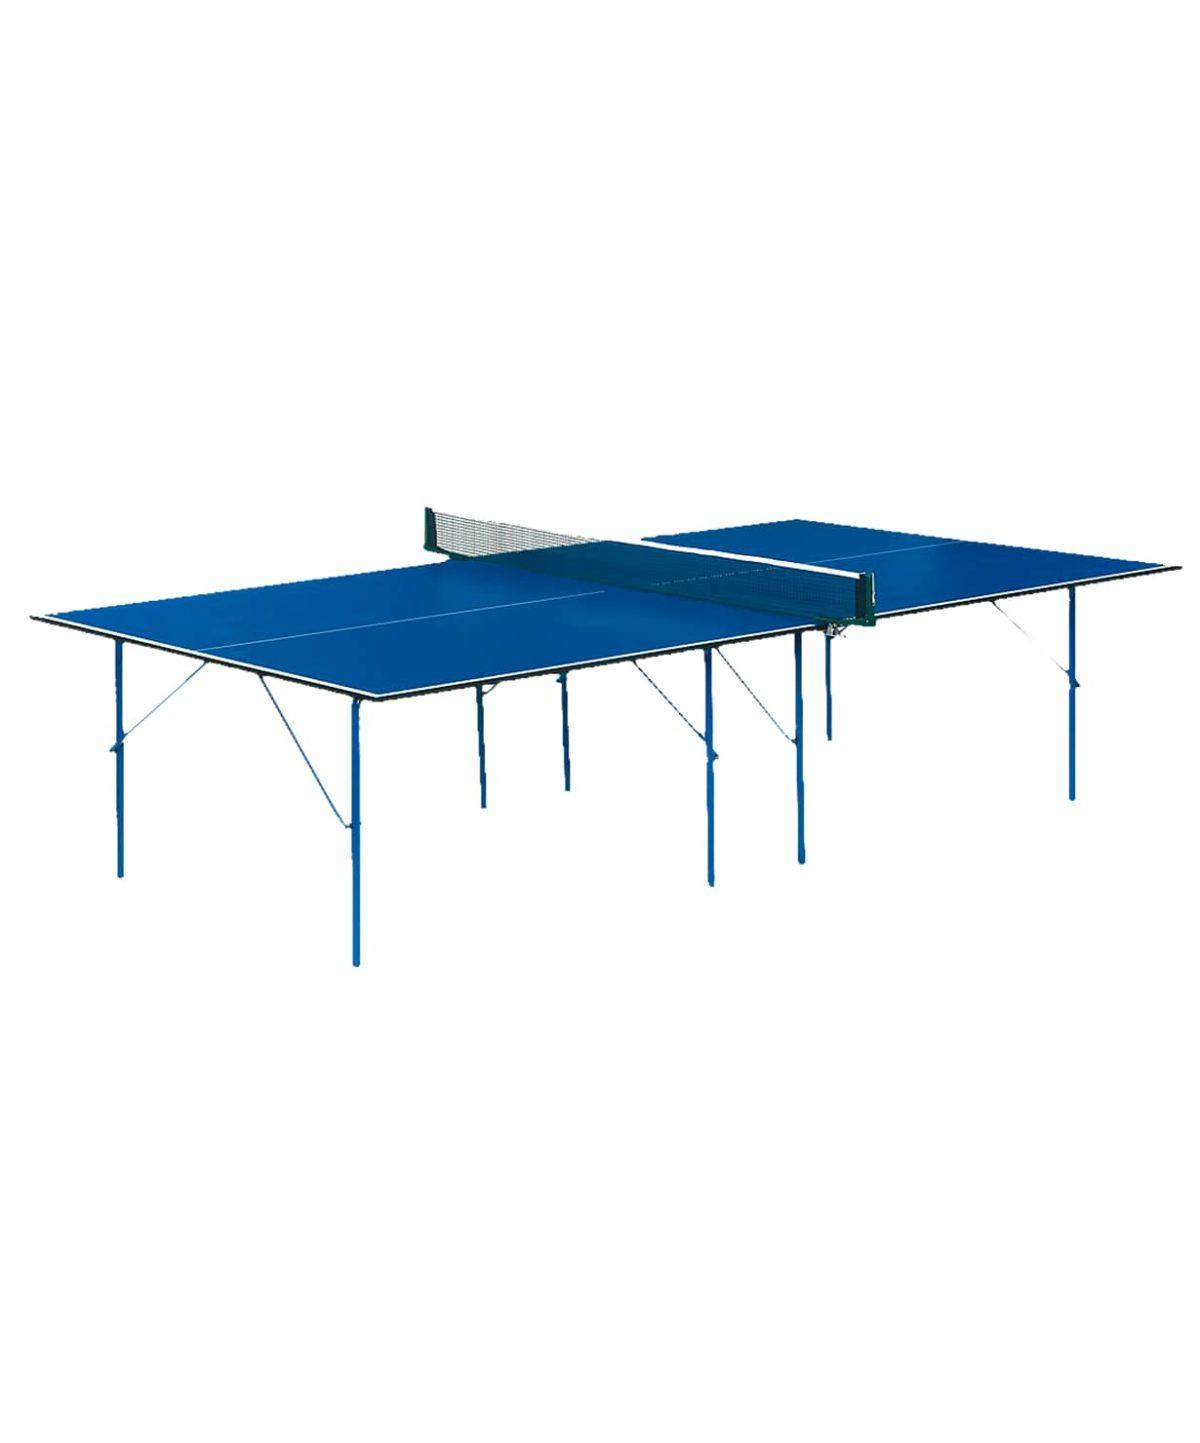 START LINE Hobby-2 Cтол для настольного тенниса  2376 - 1